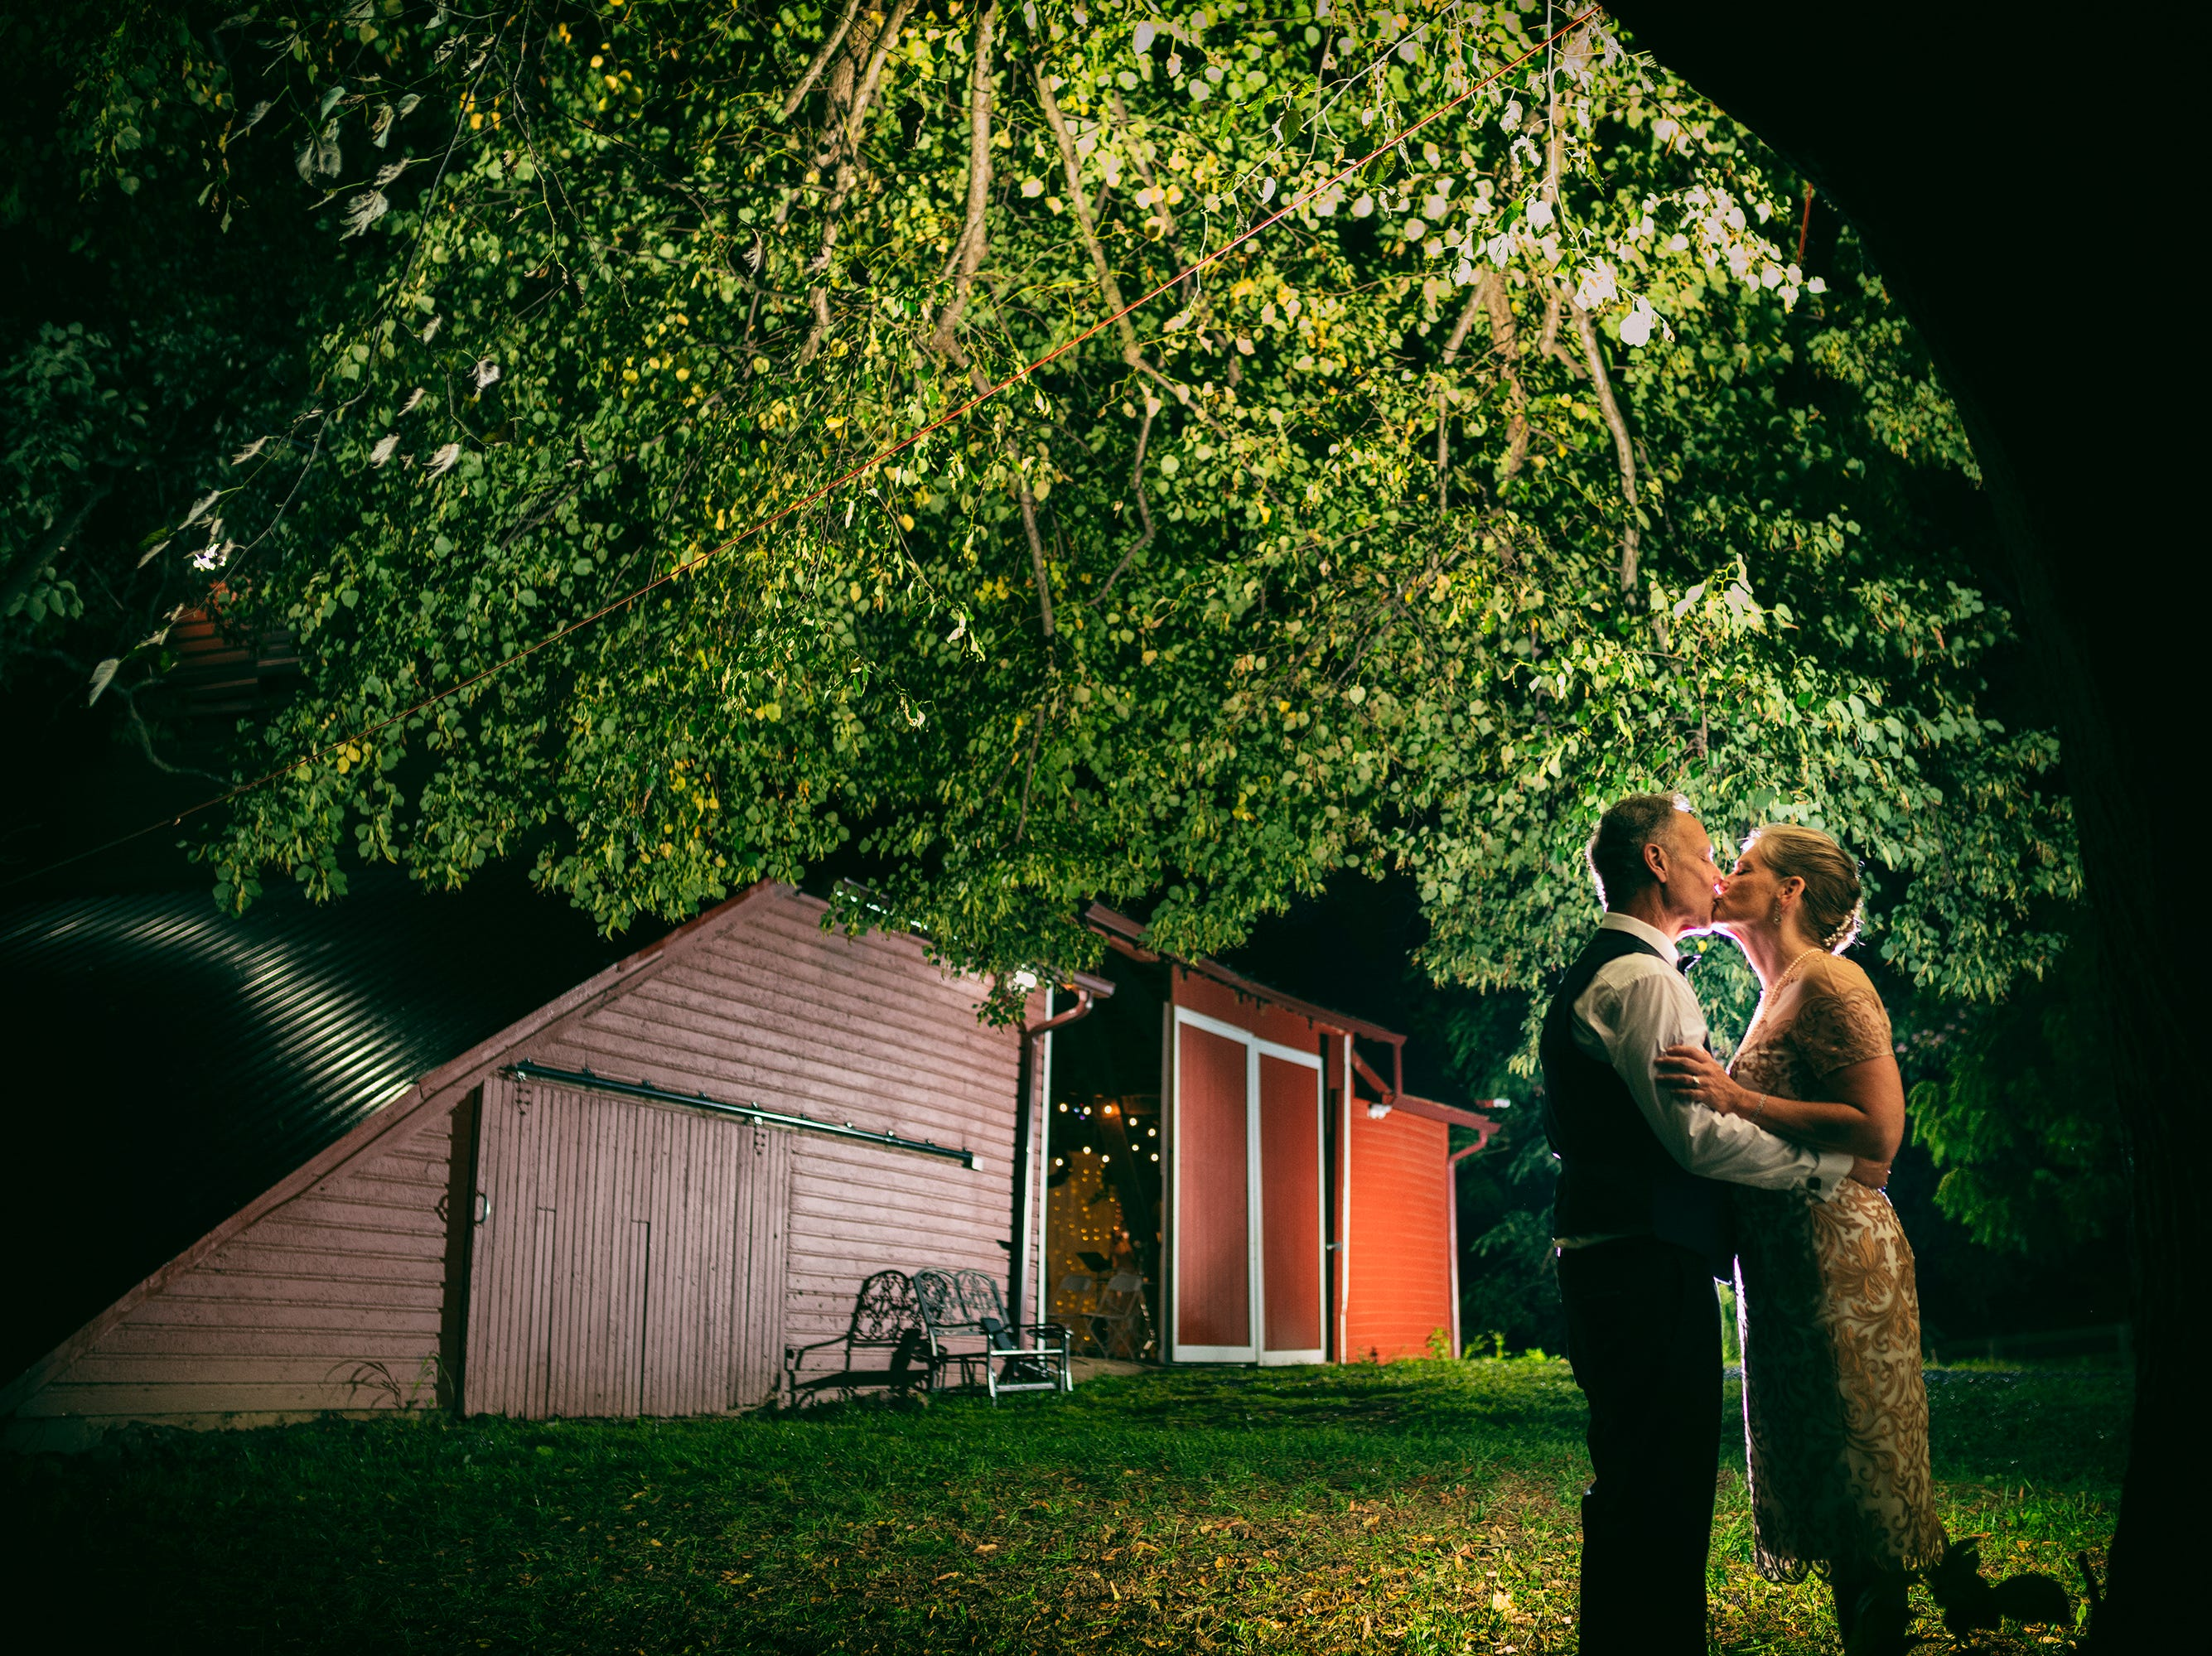 The wedding of Katherine Von Duyke and Will Minster at Avondale Hills Farm.